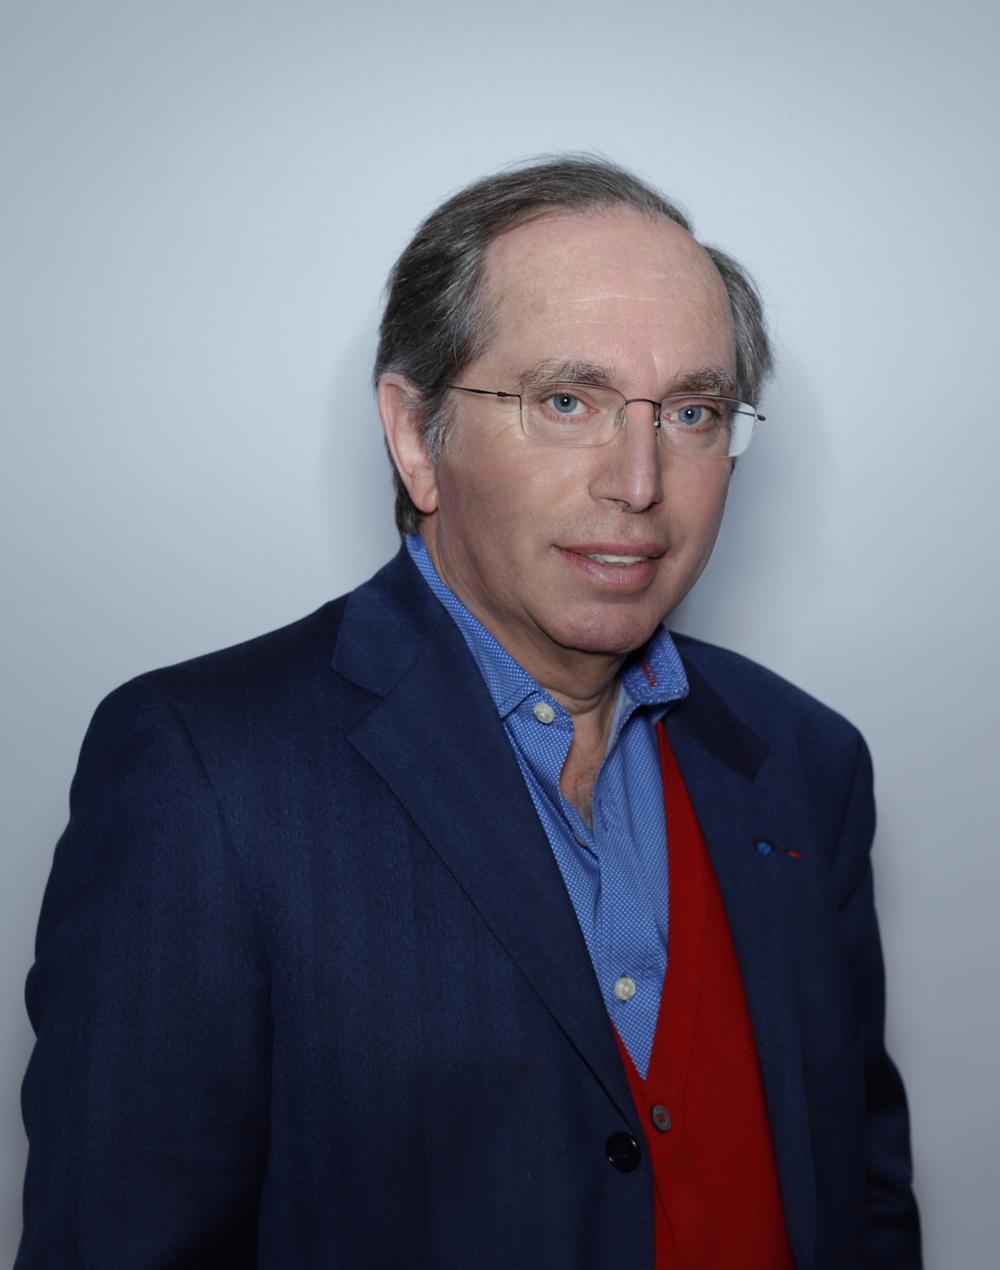 Pierre Sissmann